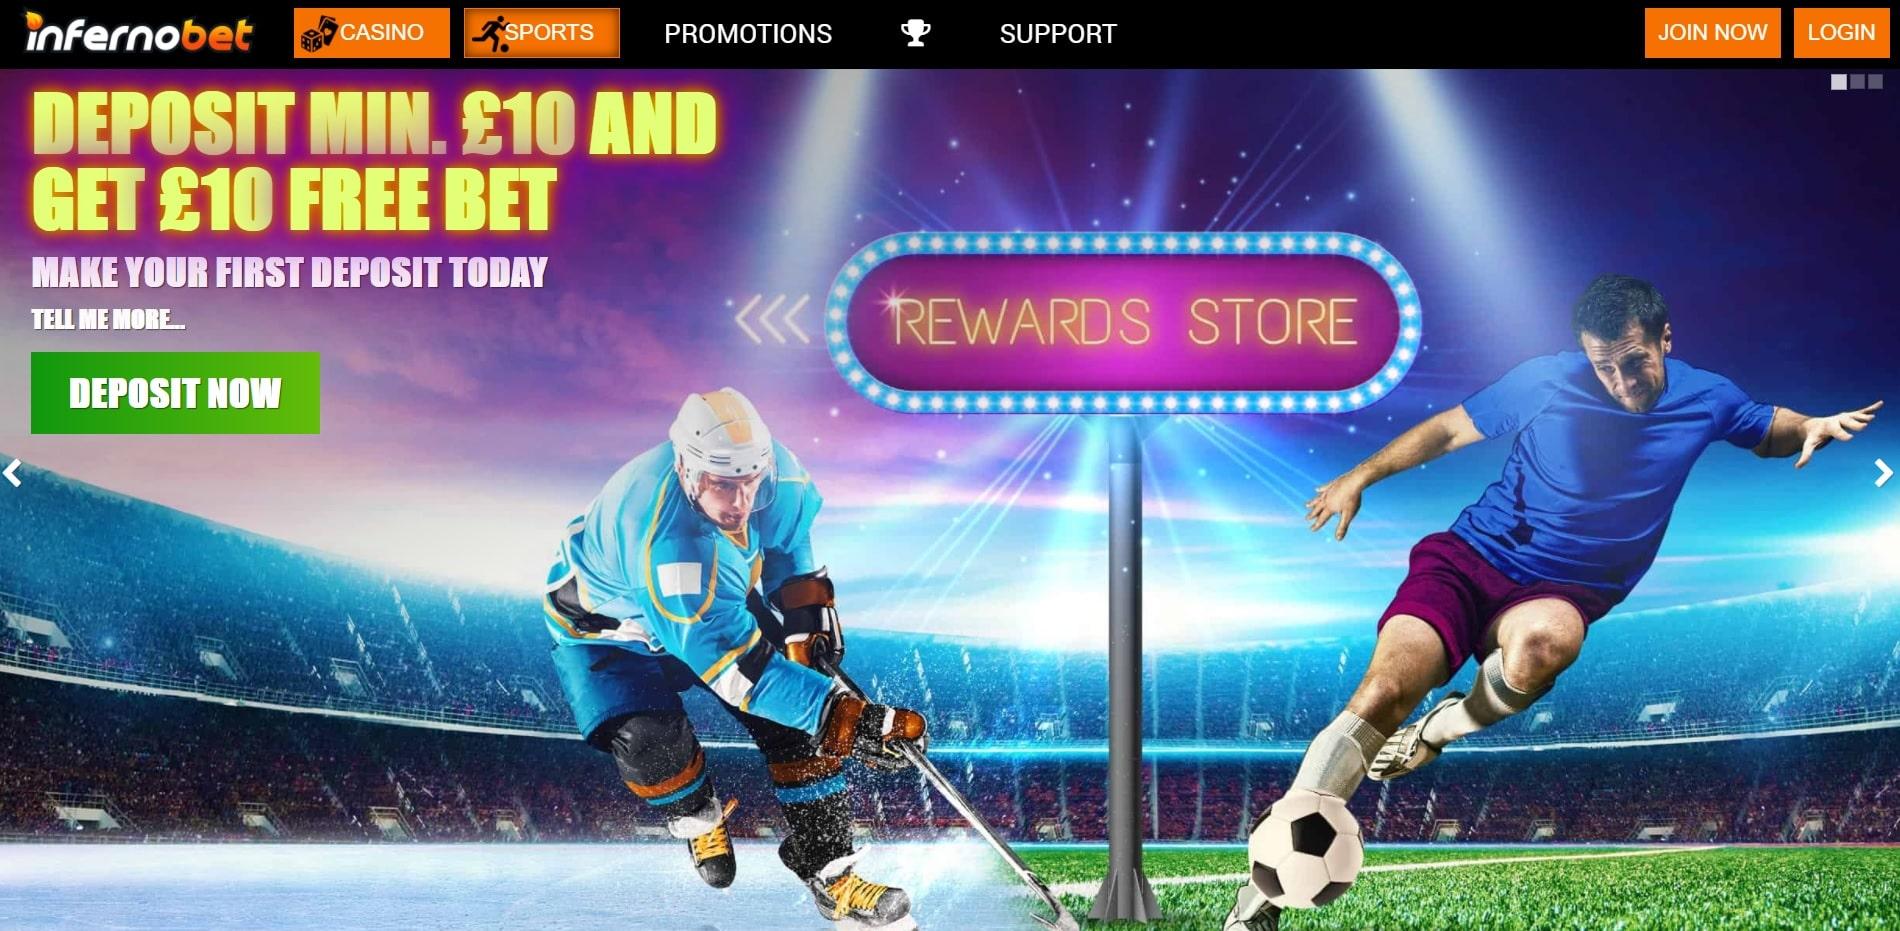 InfernoBet new betting sites